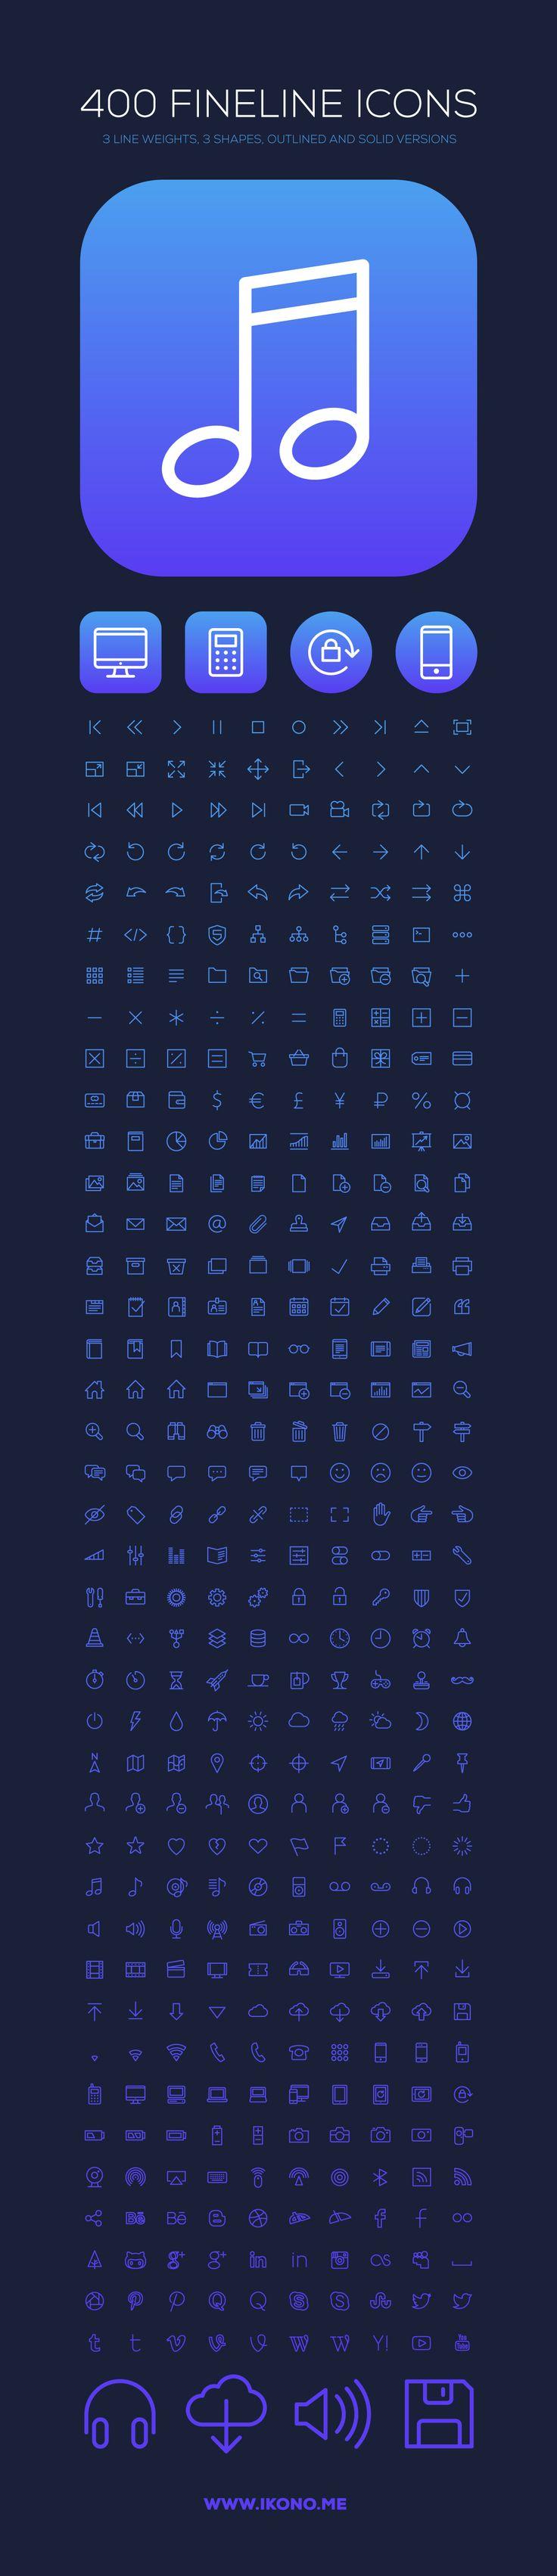 400 Fineline icons http://ikono.me/fineline-icons-pro-series/